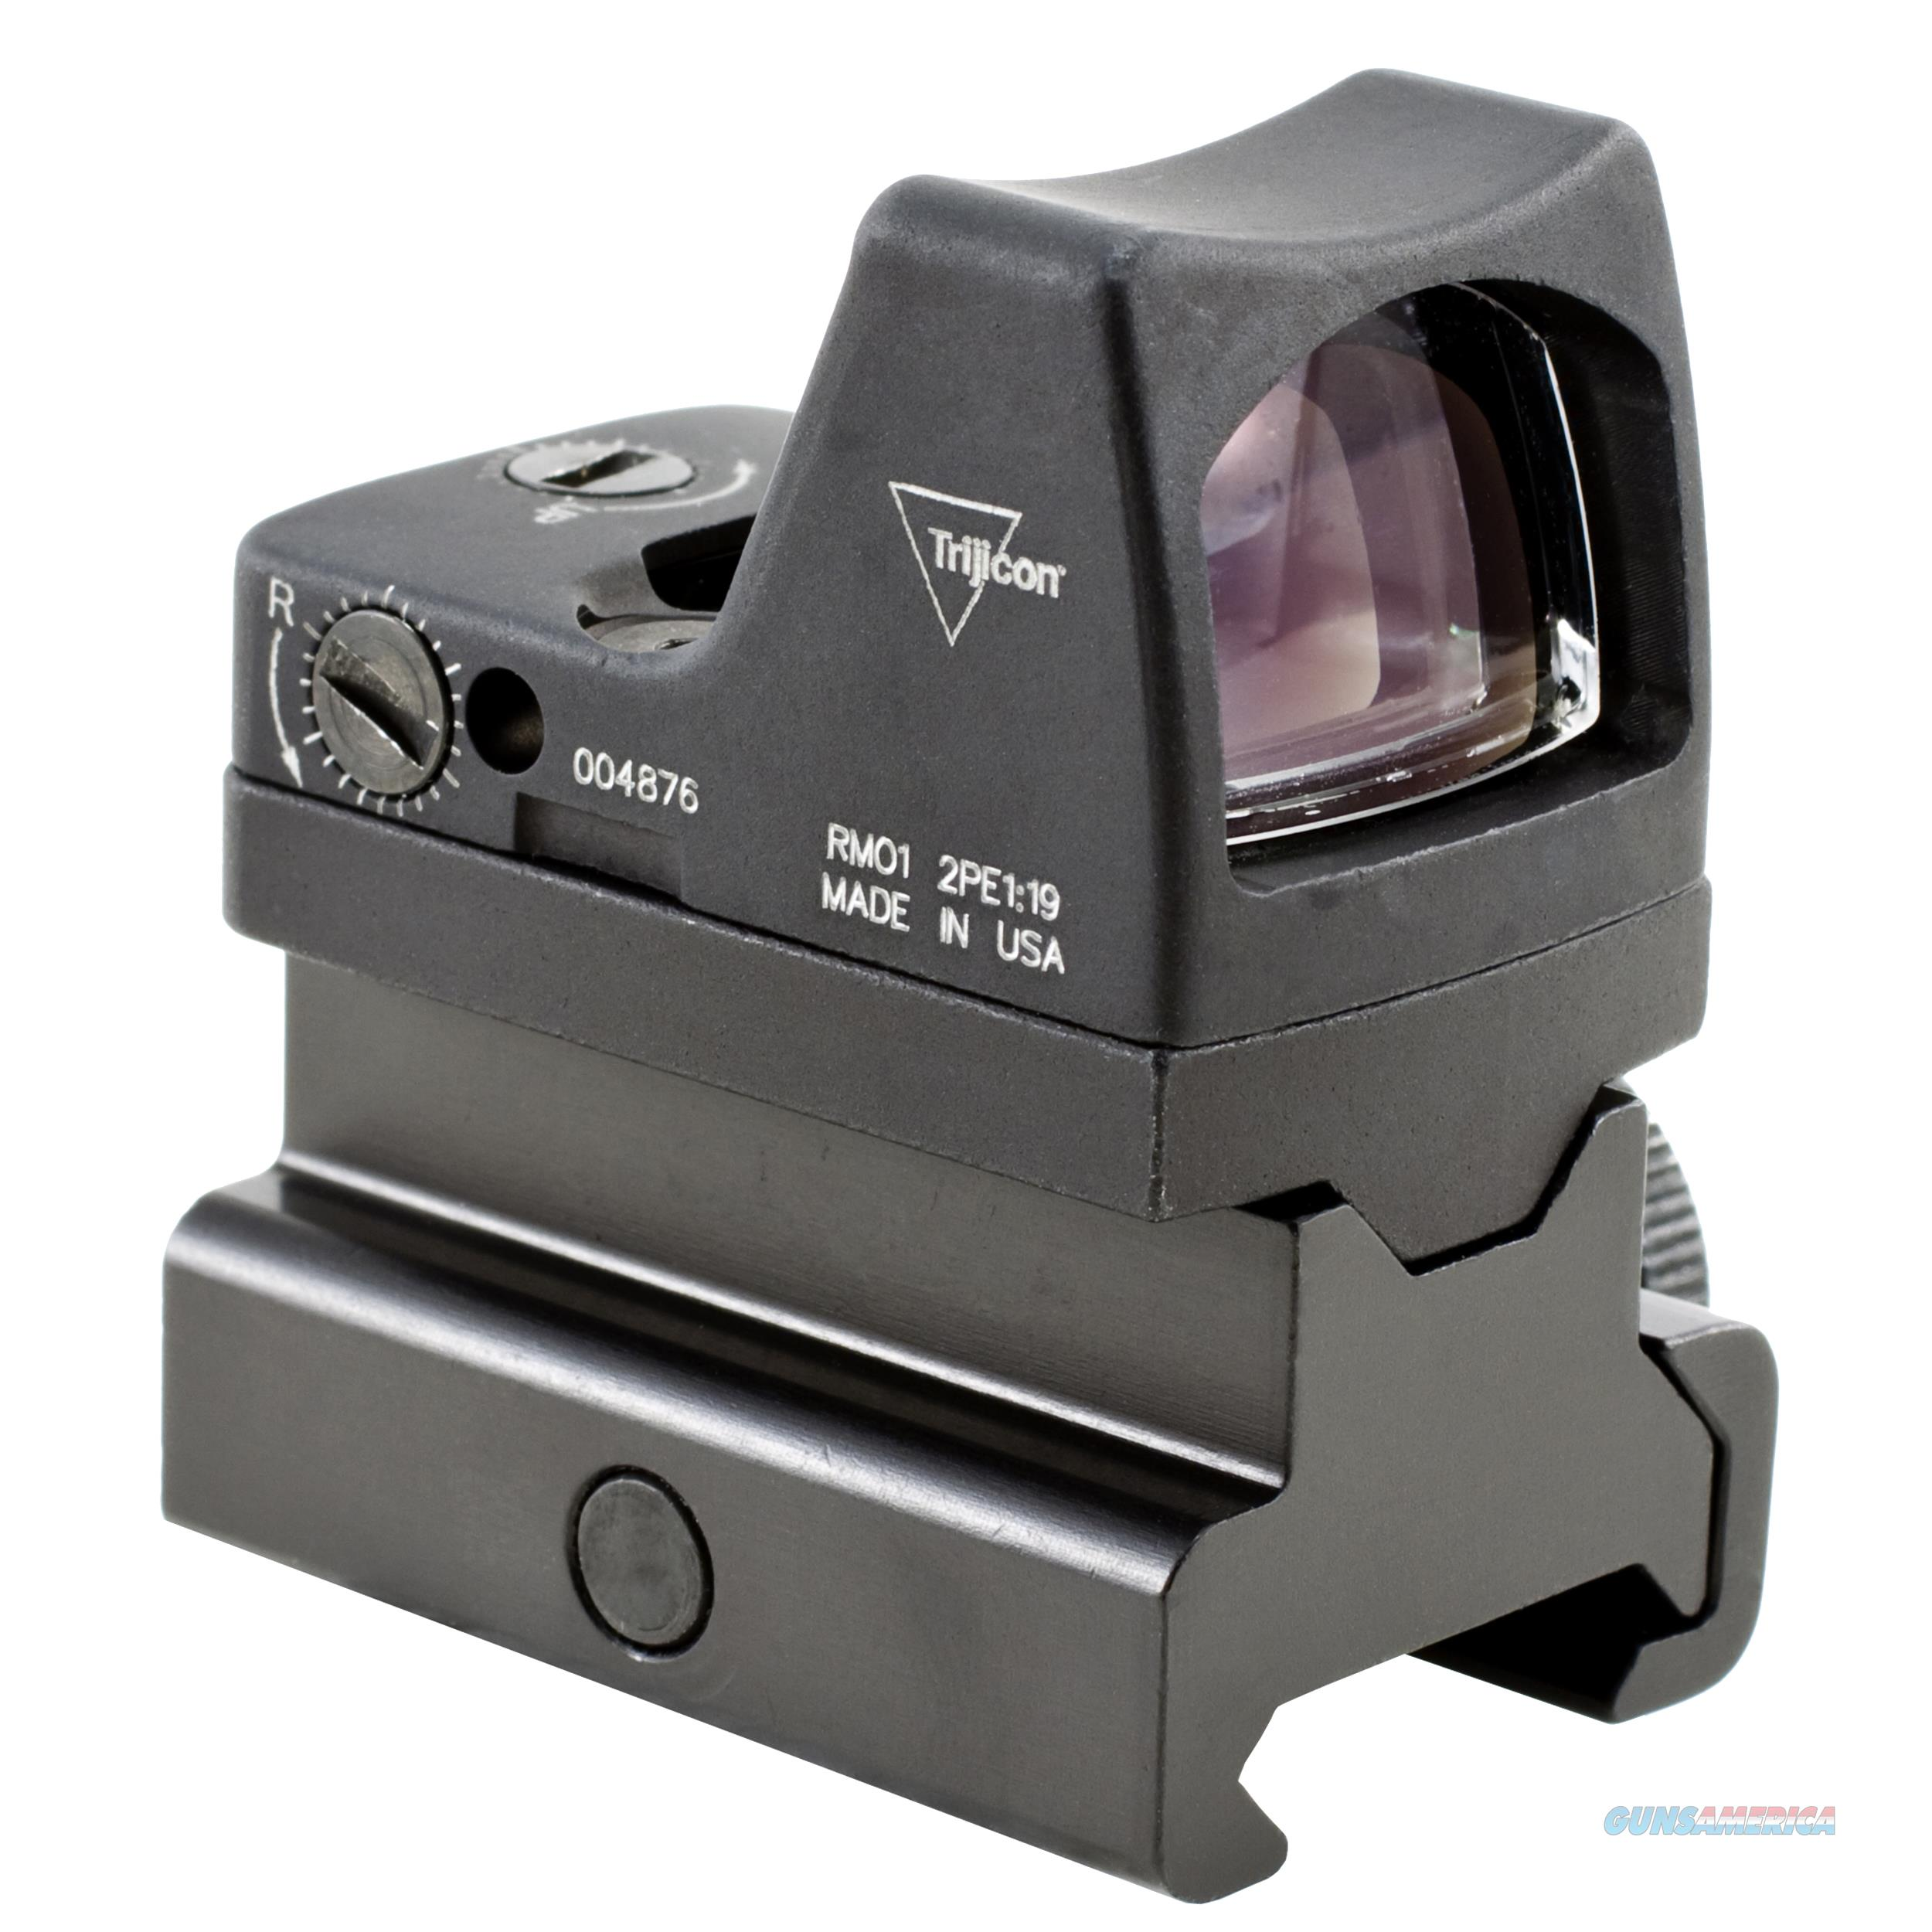 Trijicon Rmr Type 2 Led Sight RM01C700602  Non-Guns > Scopes/Mounts/Rings & Optics > Mounts > Other